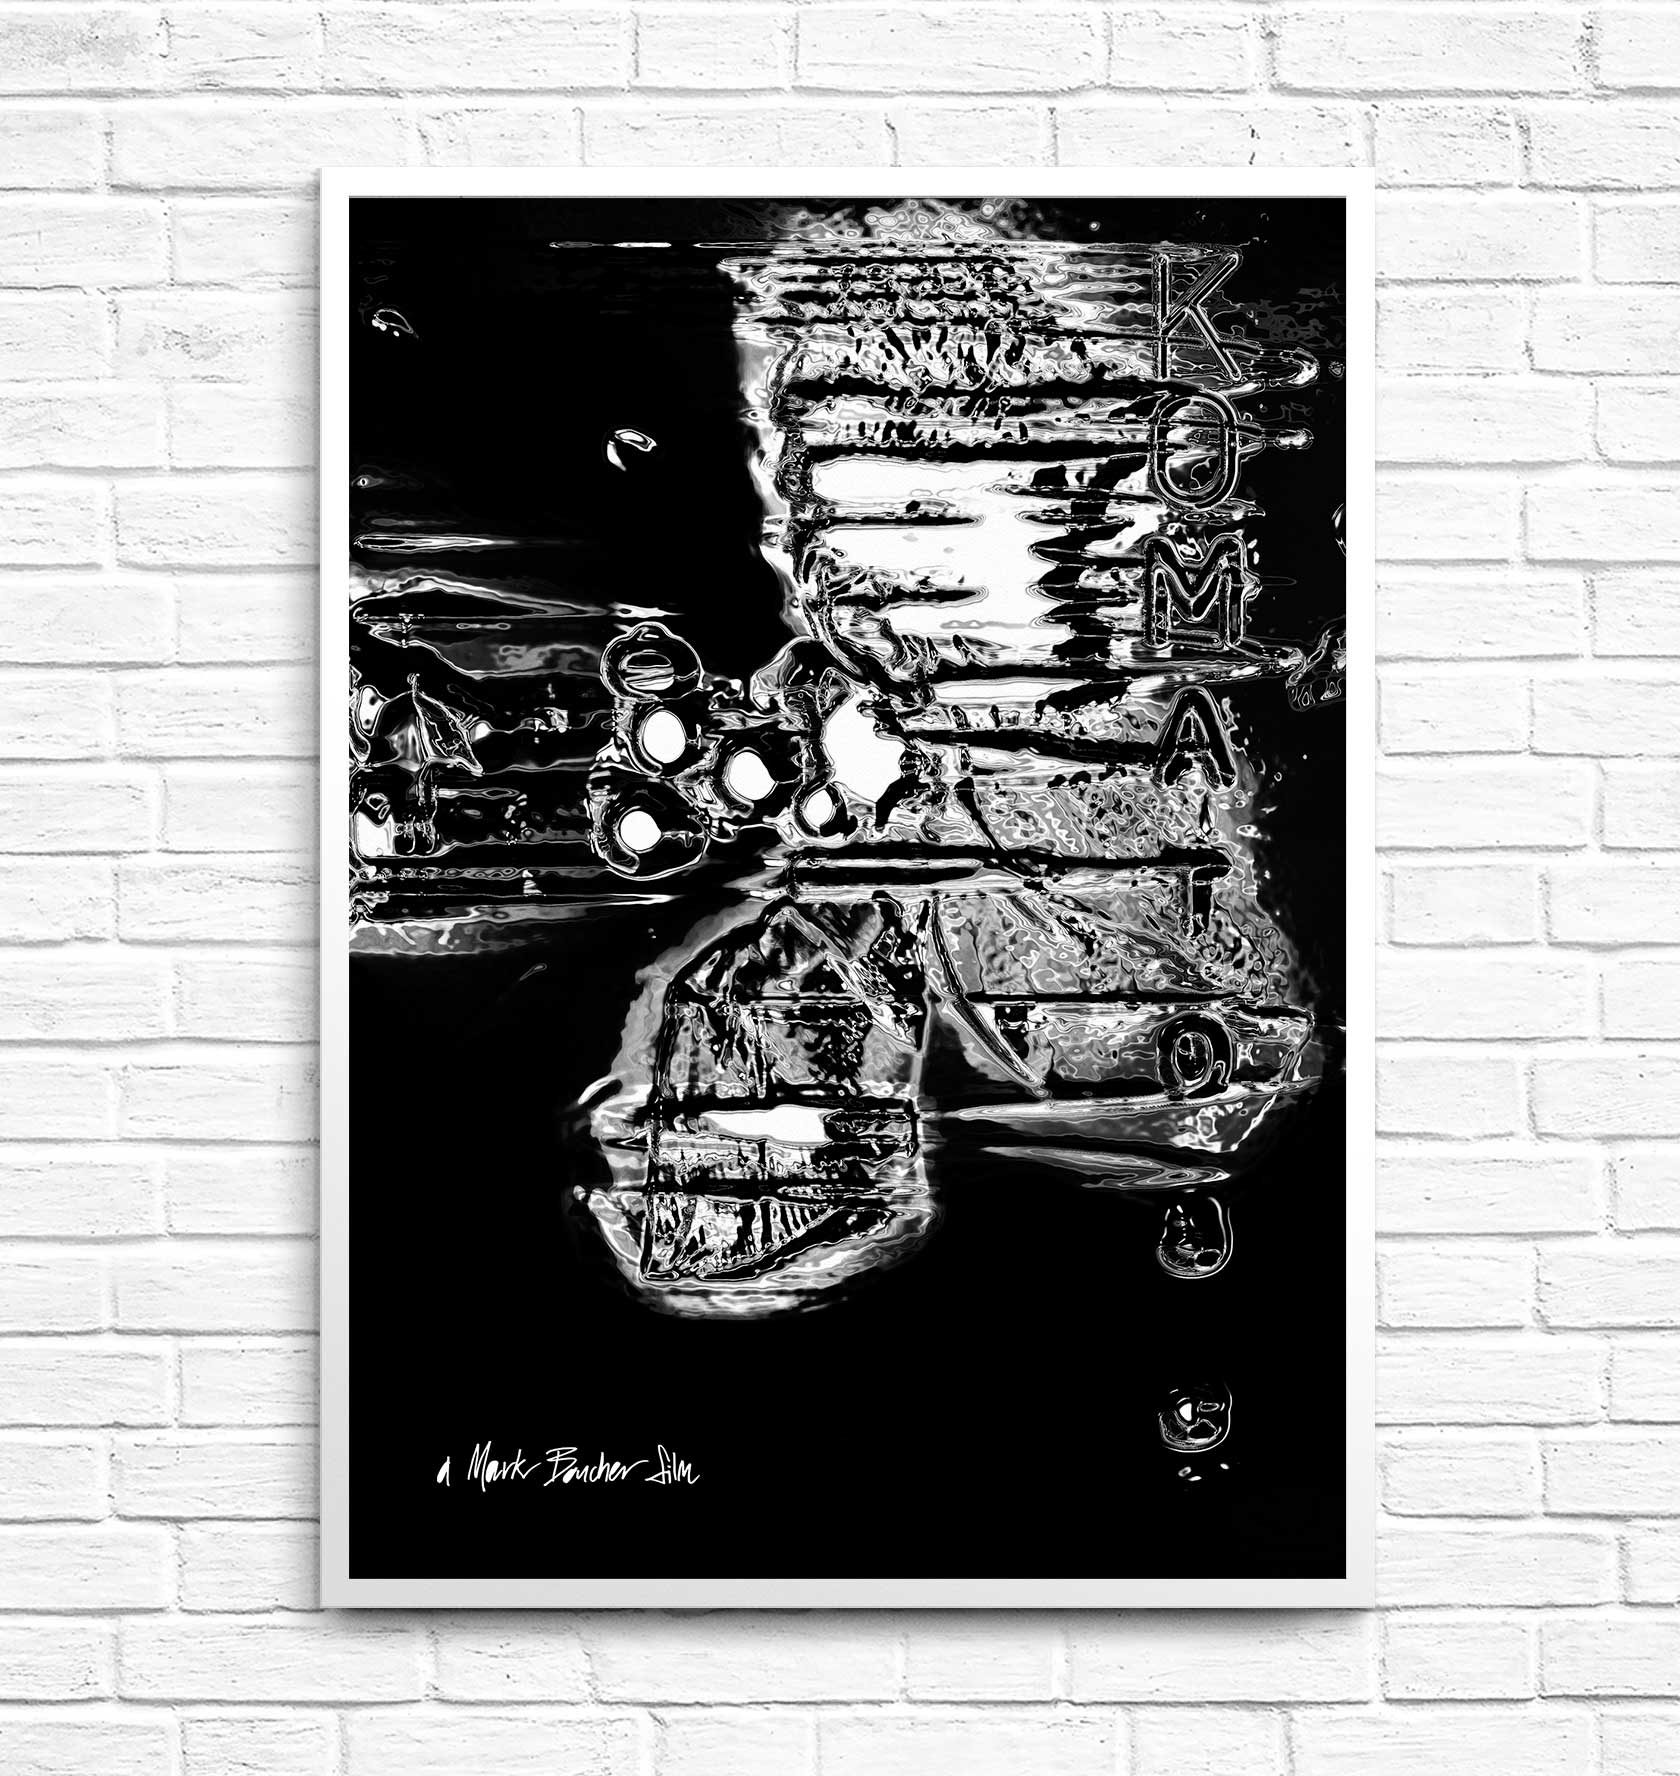 Komatose Film Poster 3 by Furia